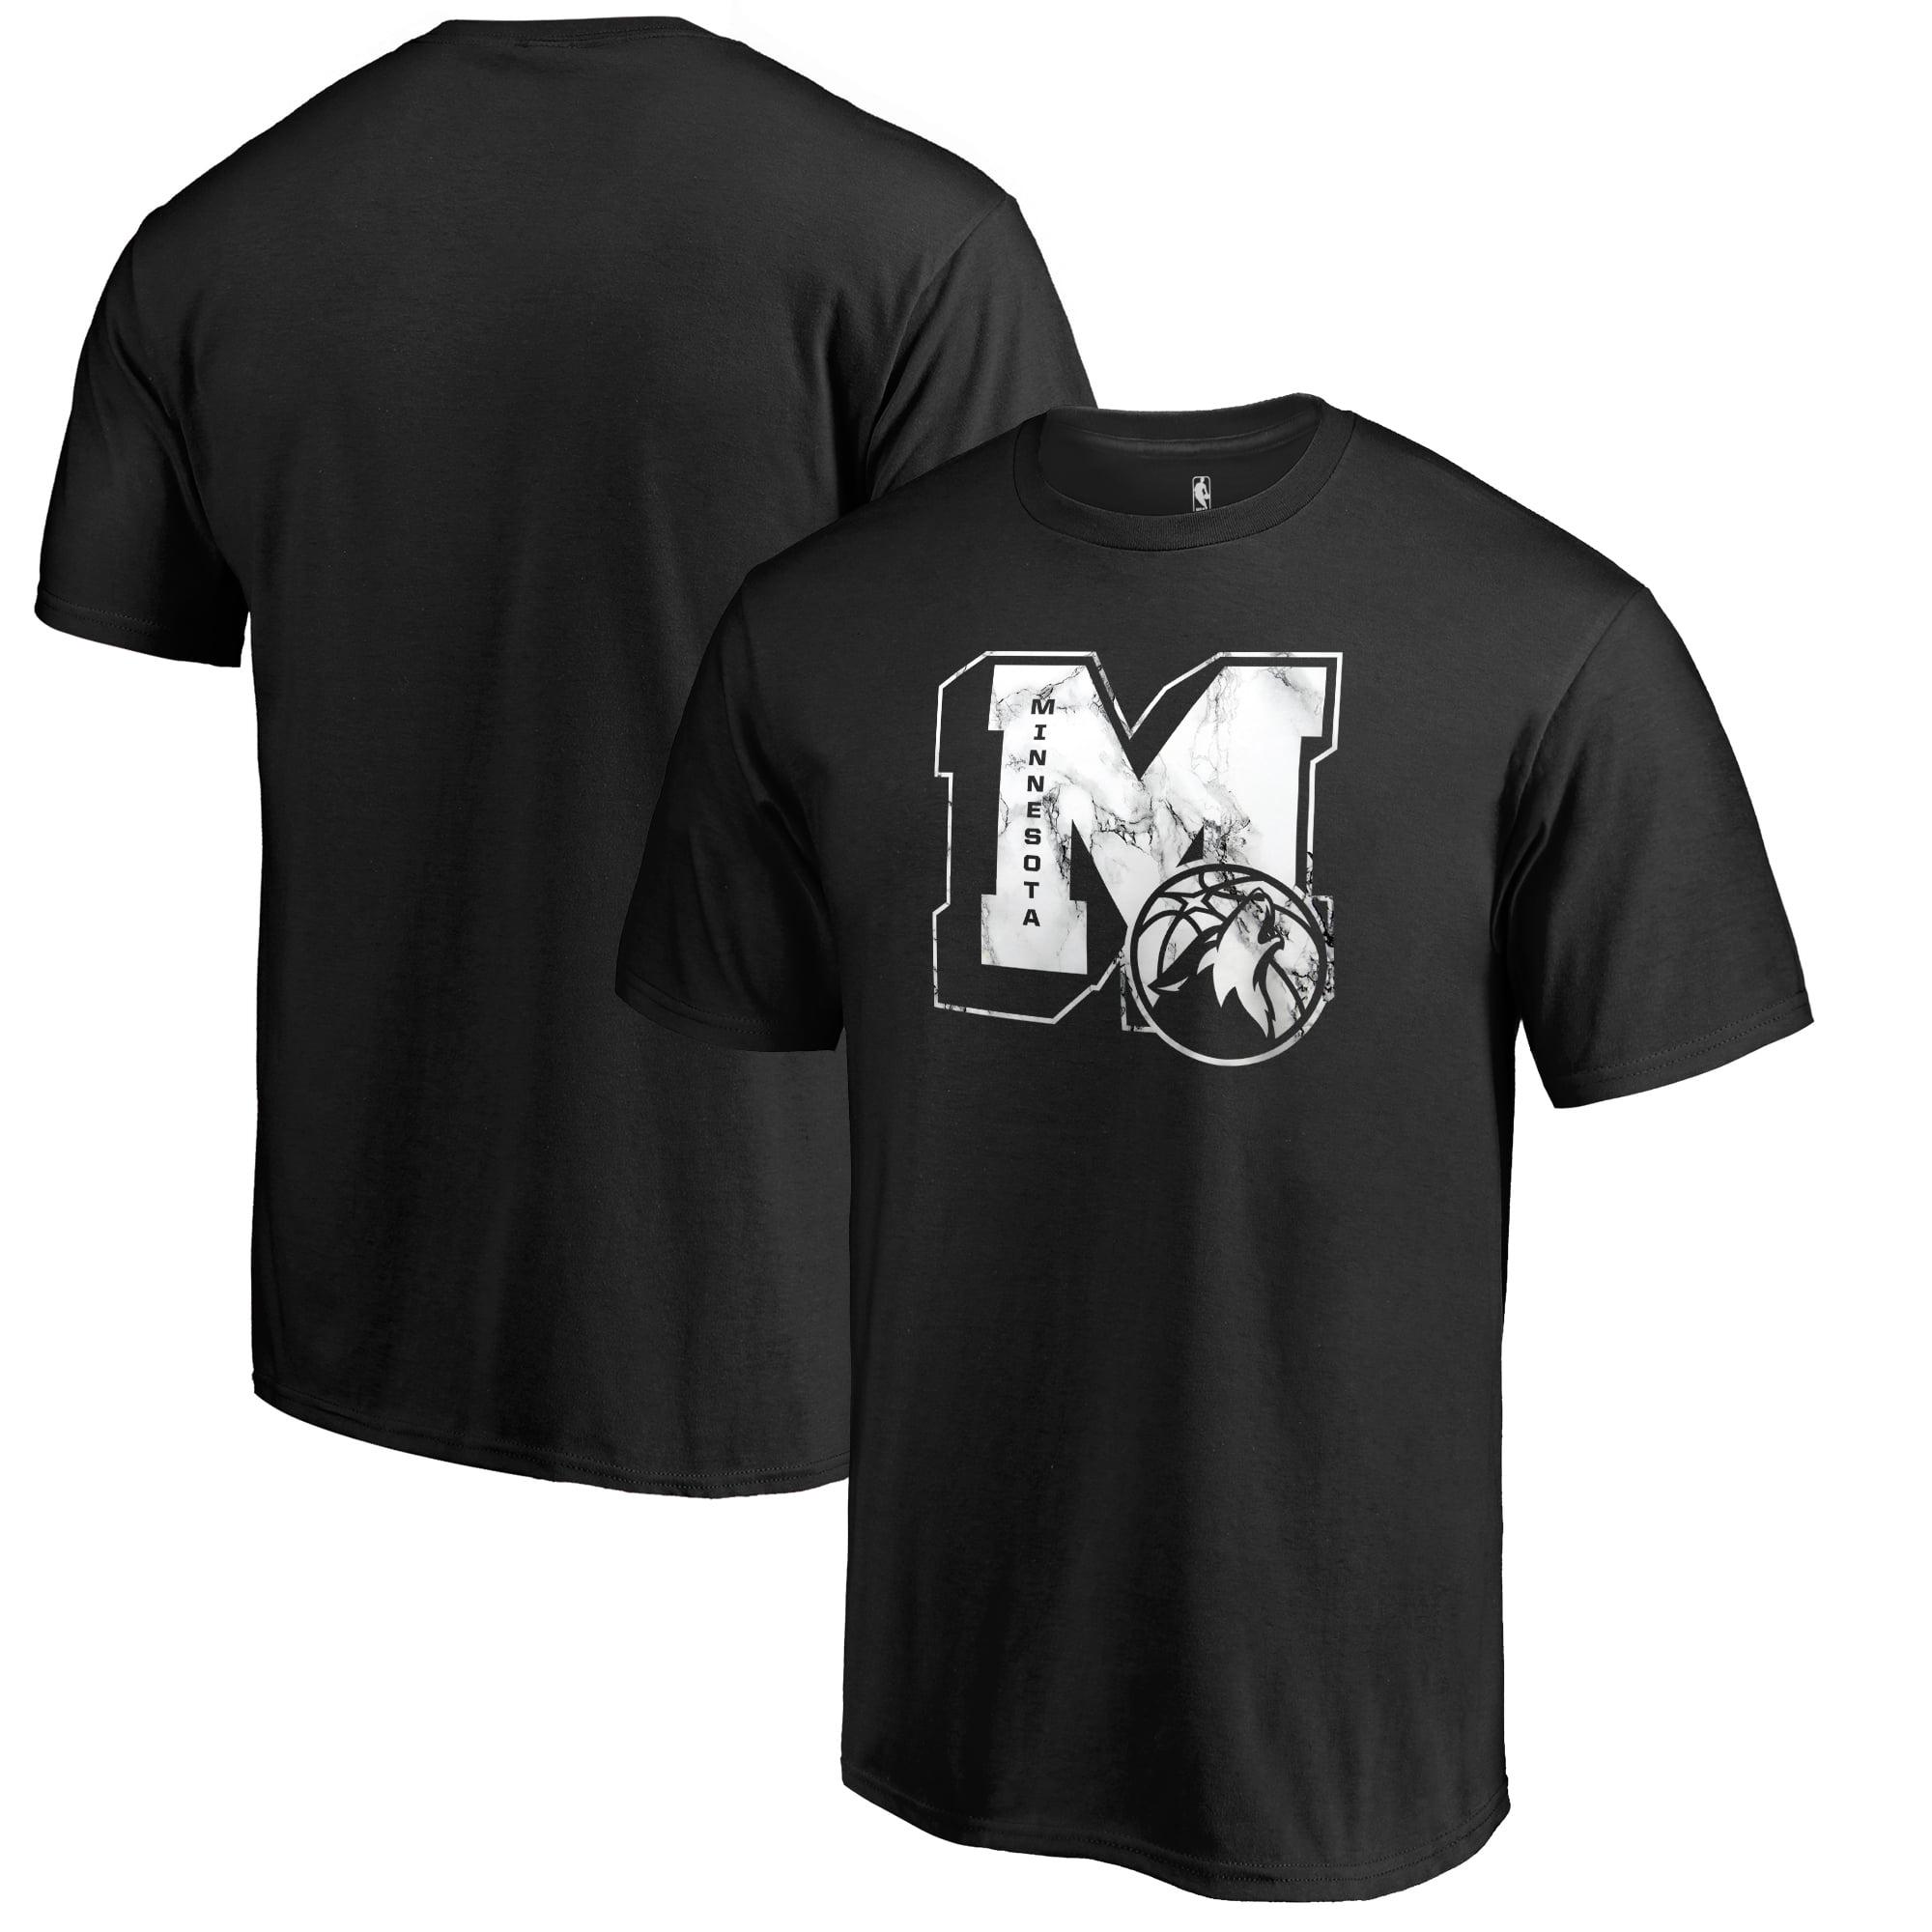 Minnesota Timberwolves Fanatics Branded Letterman T-Shirt - Black